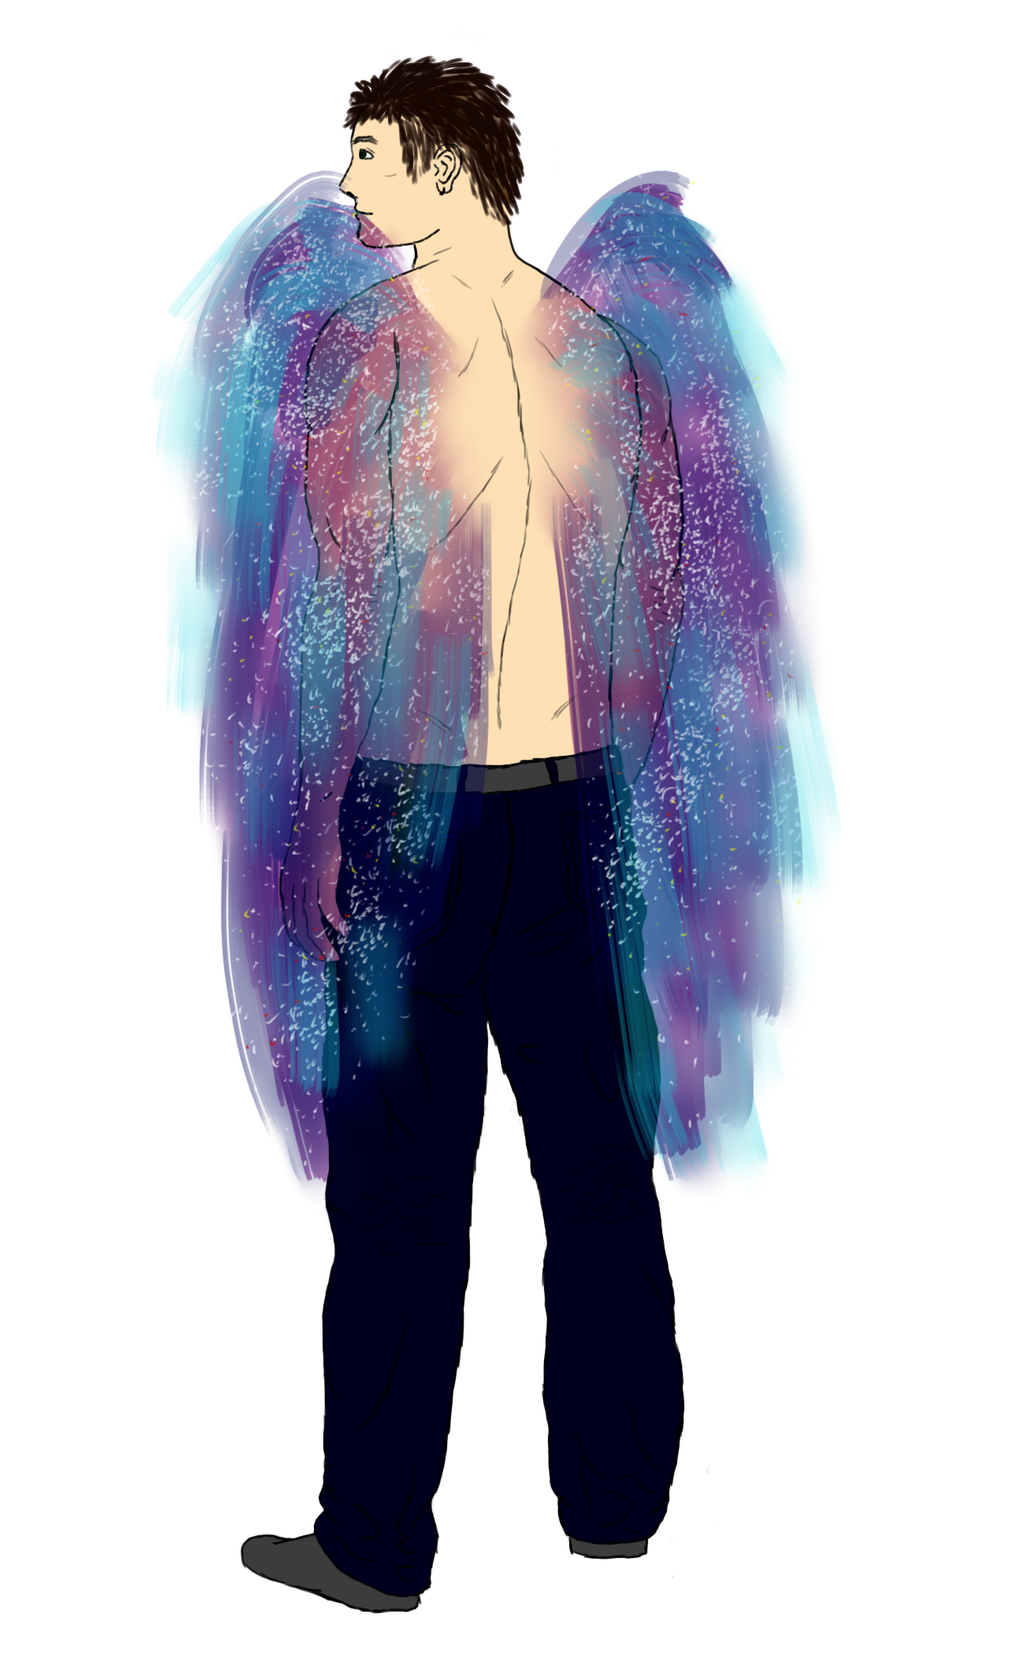 Ian's Wings by Longing-to-Belong